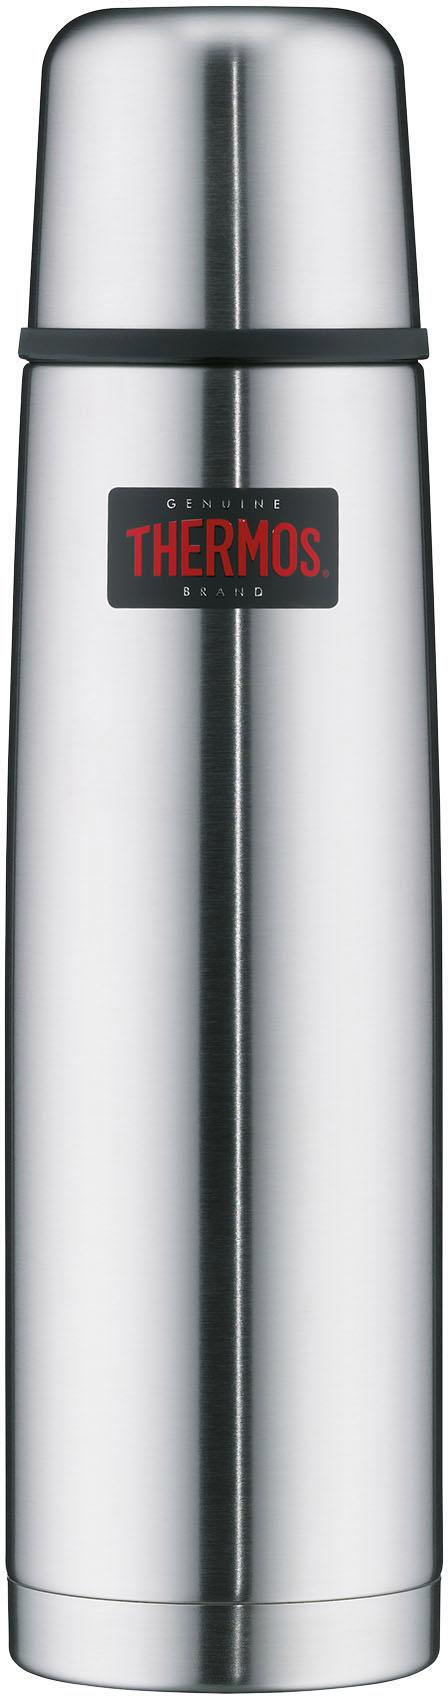 THERMOS Isolierkanne Light & Compact, 1 l, (1), aus bruchfestem Edelstahl silberfarben Kannen Geschirr, Porzellan Tischaccessoires Haushaltswaren